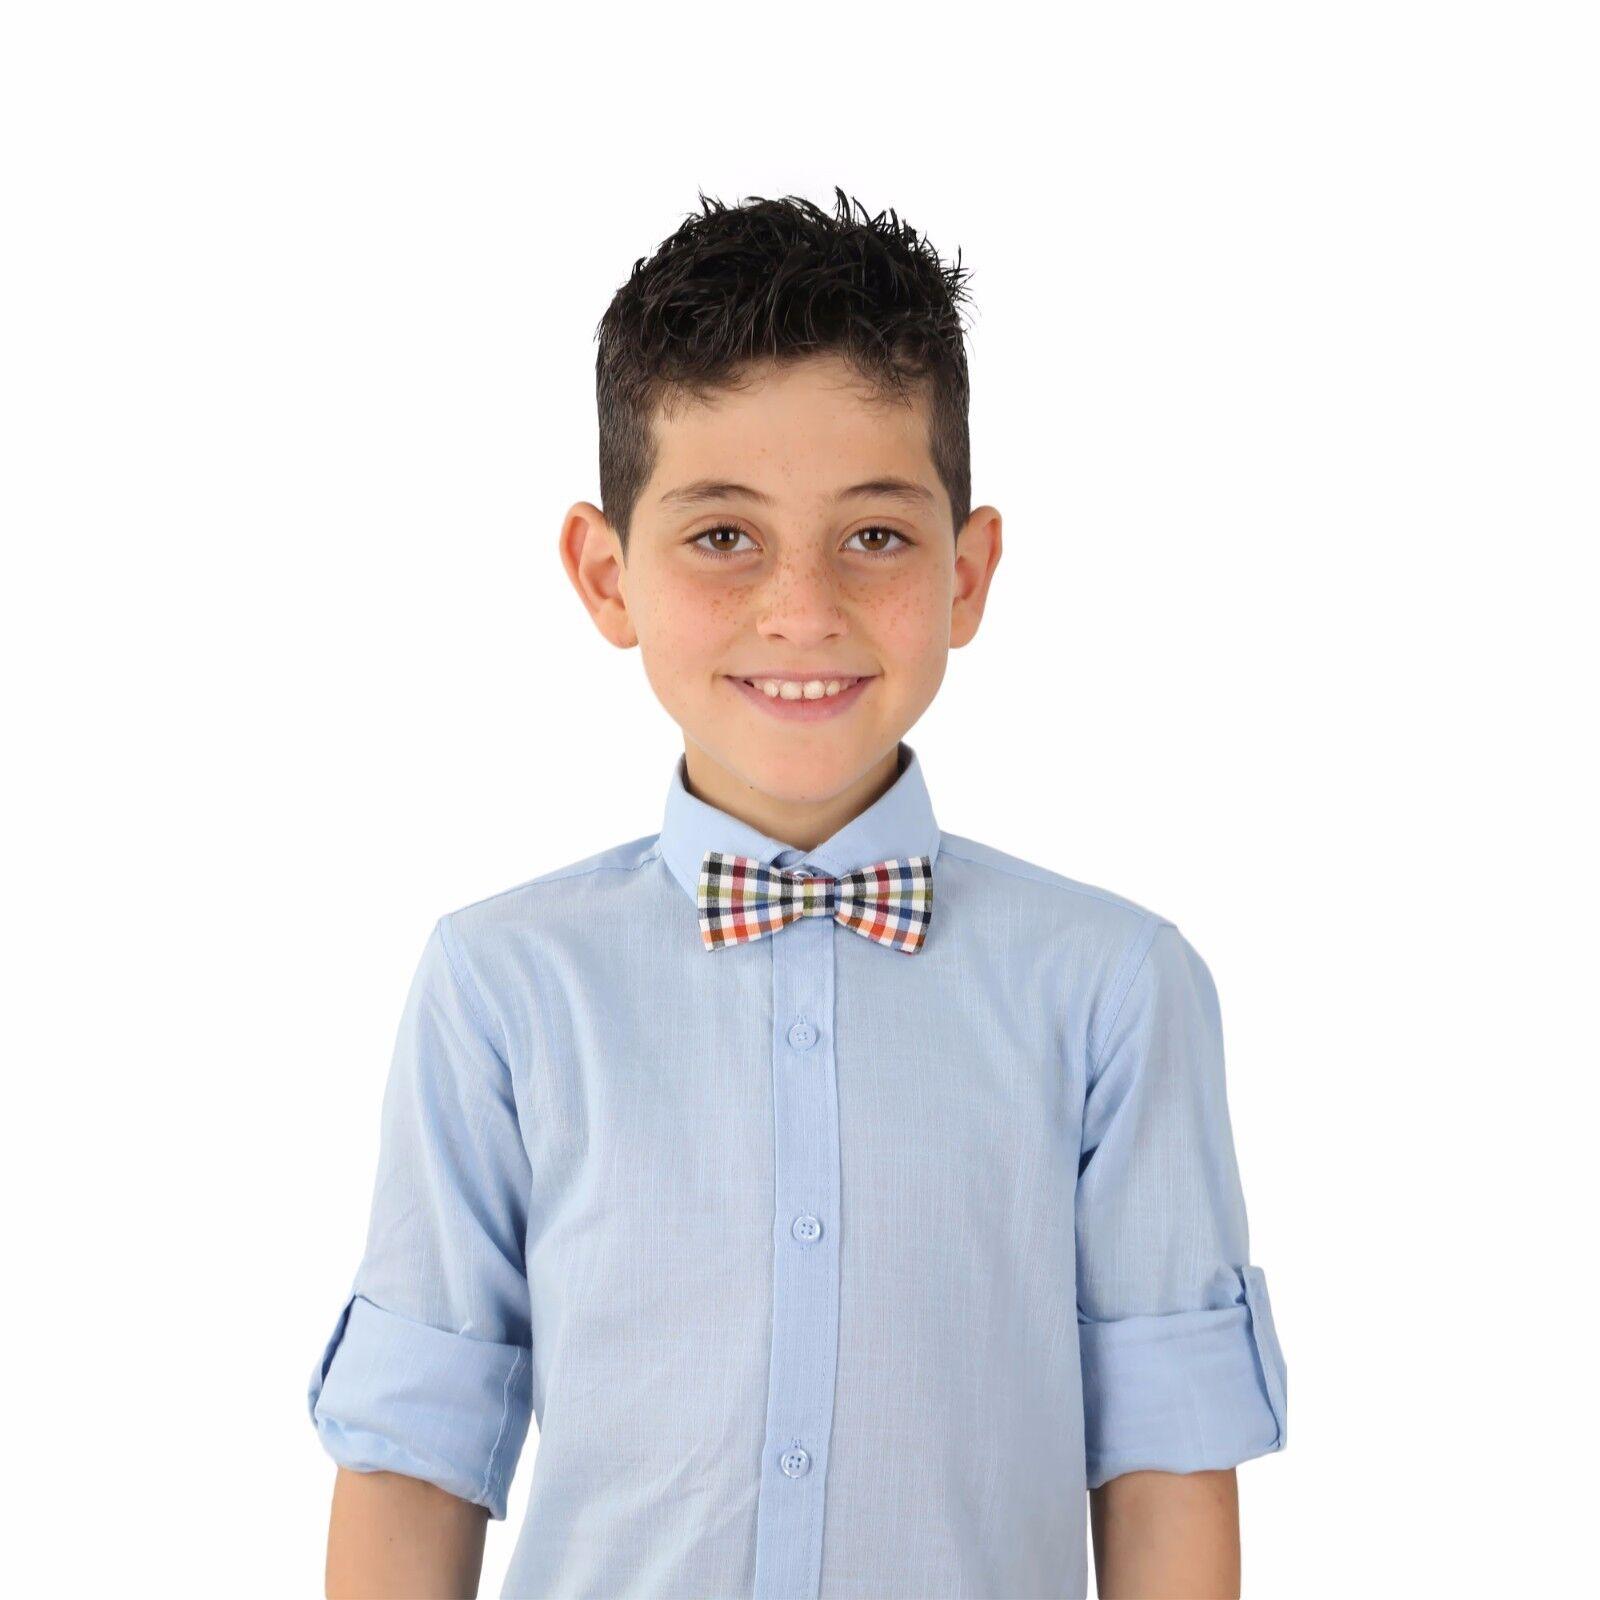 Boys Kids Cotton Slim Fit Classic Formal Sky Blue Shirt